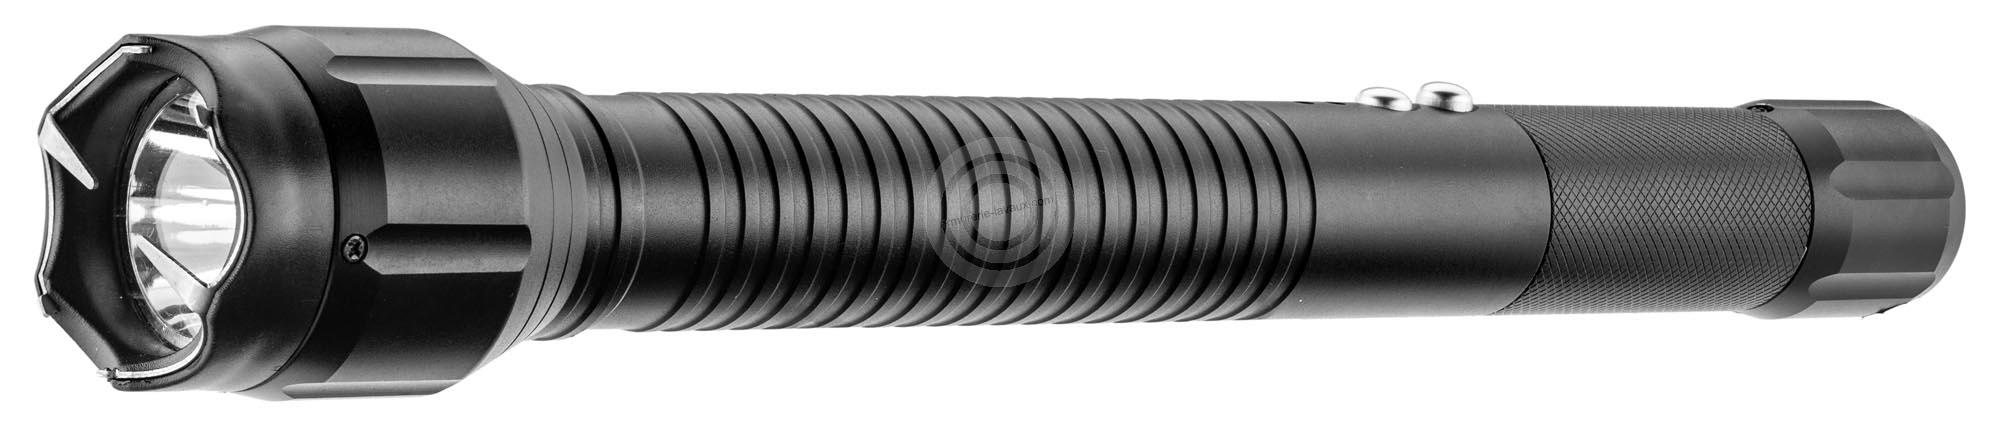 Lampe matraque Shocker CONCORDE 2 000 000 Volts (36 cm)